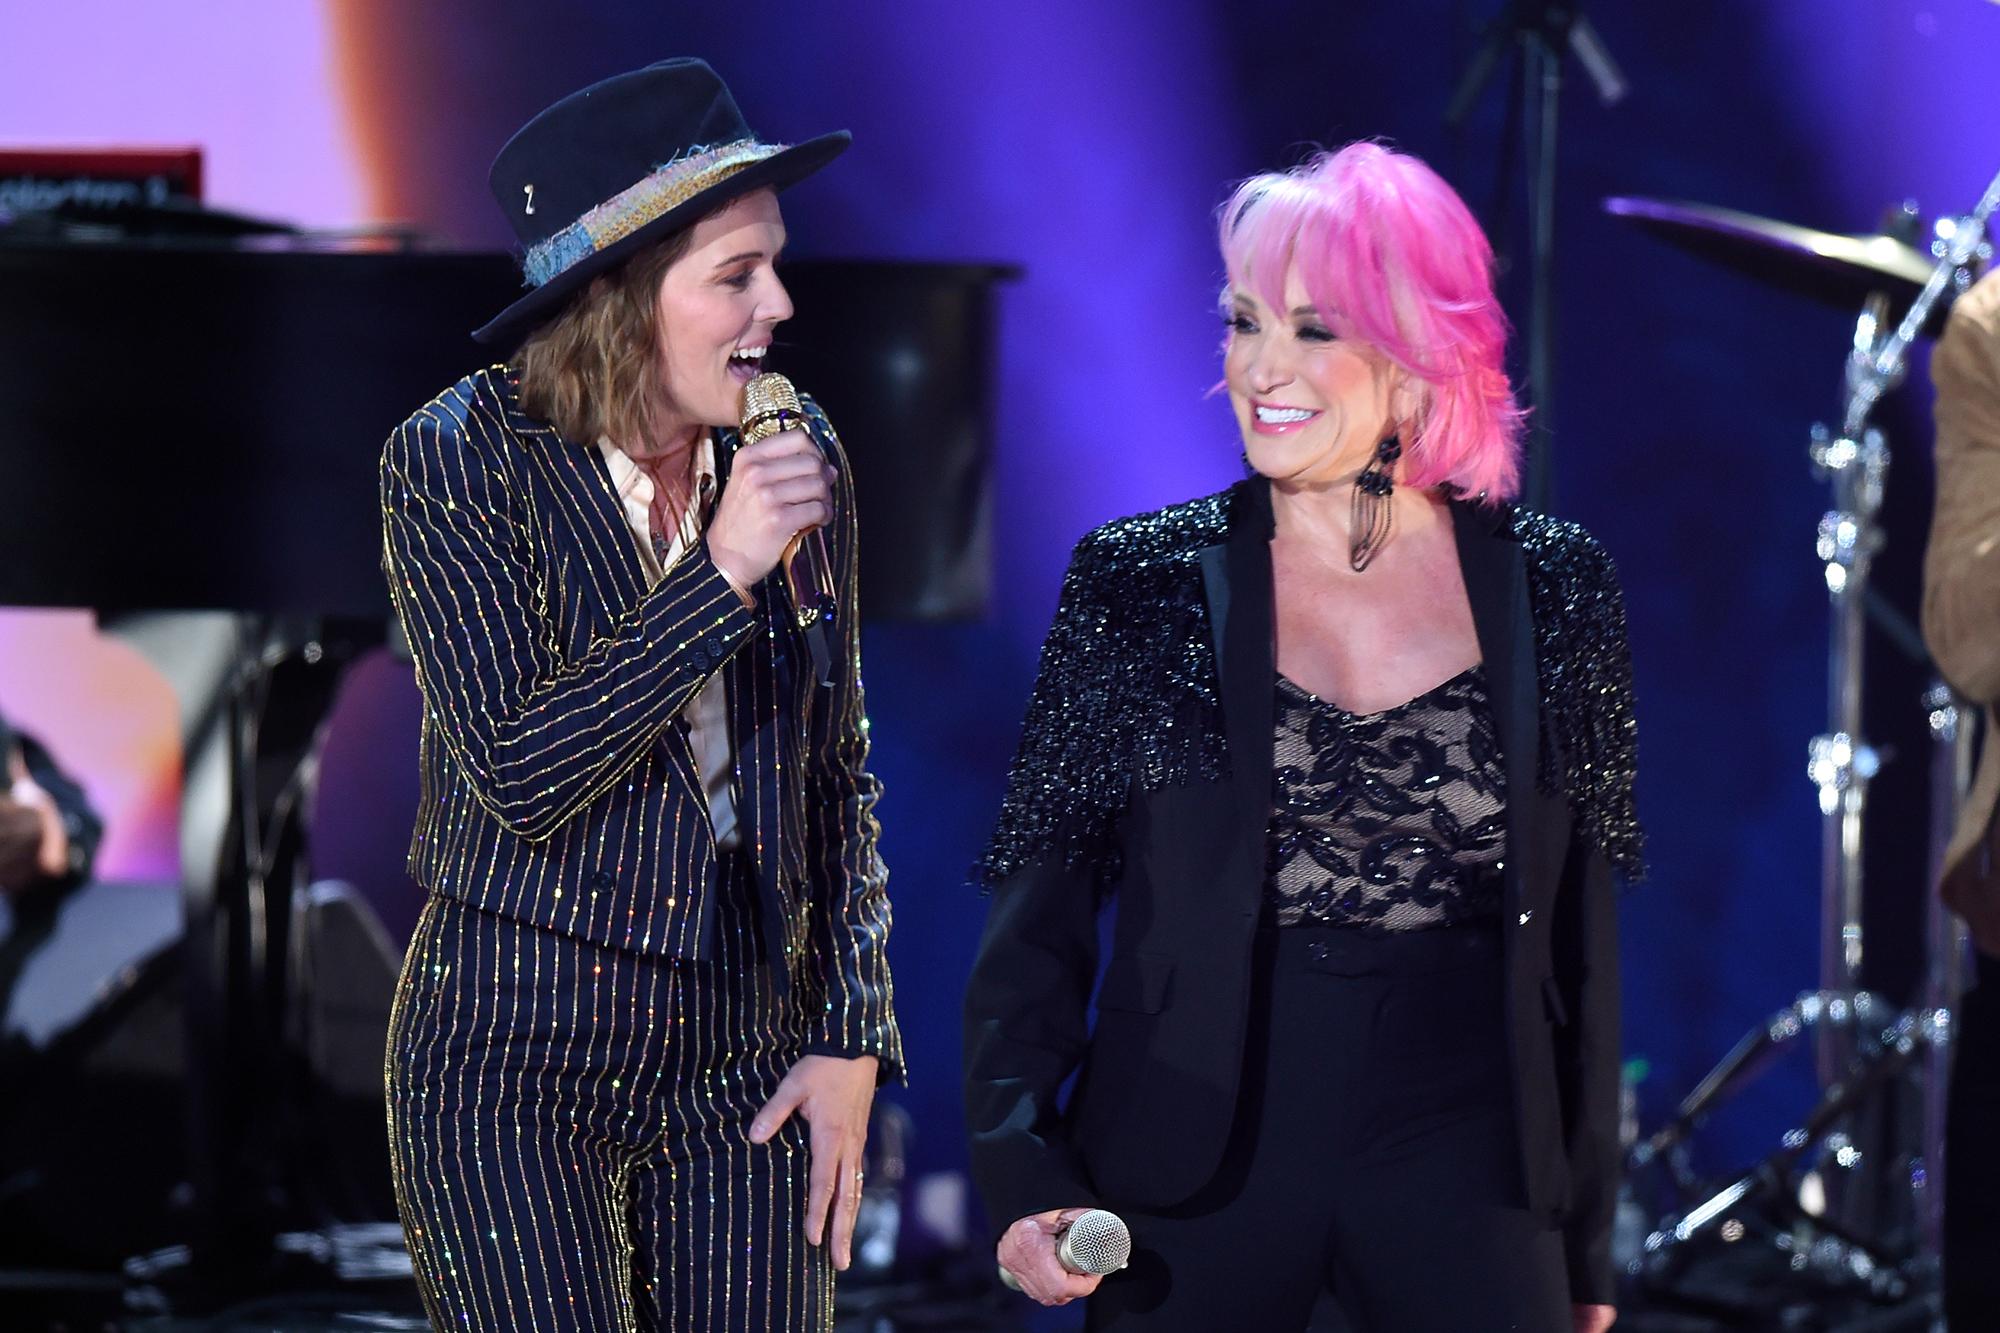 See Tanya Tucker, Brandi Carlile's Gritty 'Delta Dawn' at CMT Music Awards